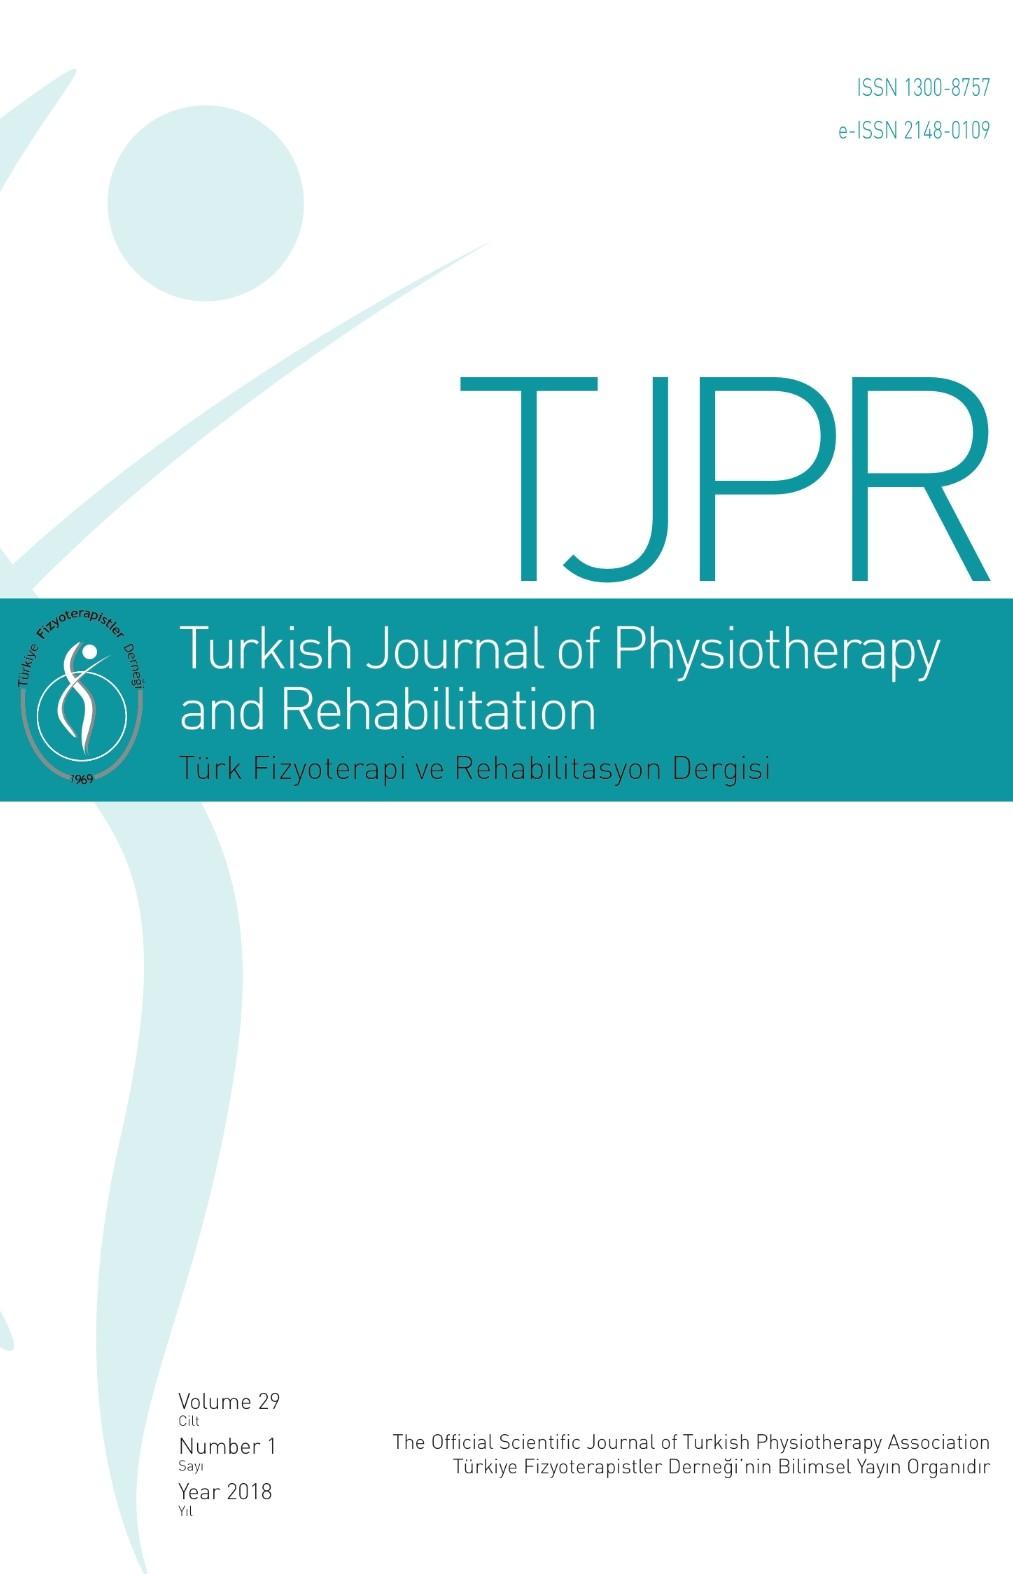 Fizyoterapi Rehabilitasyon